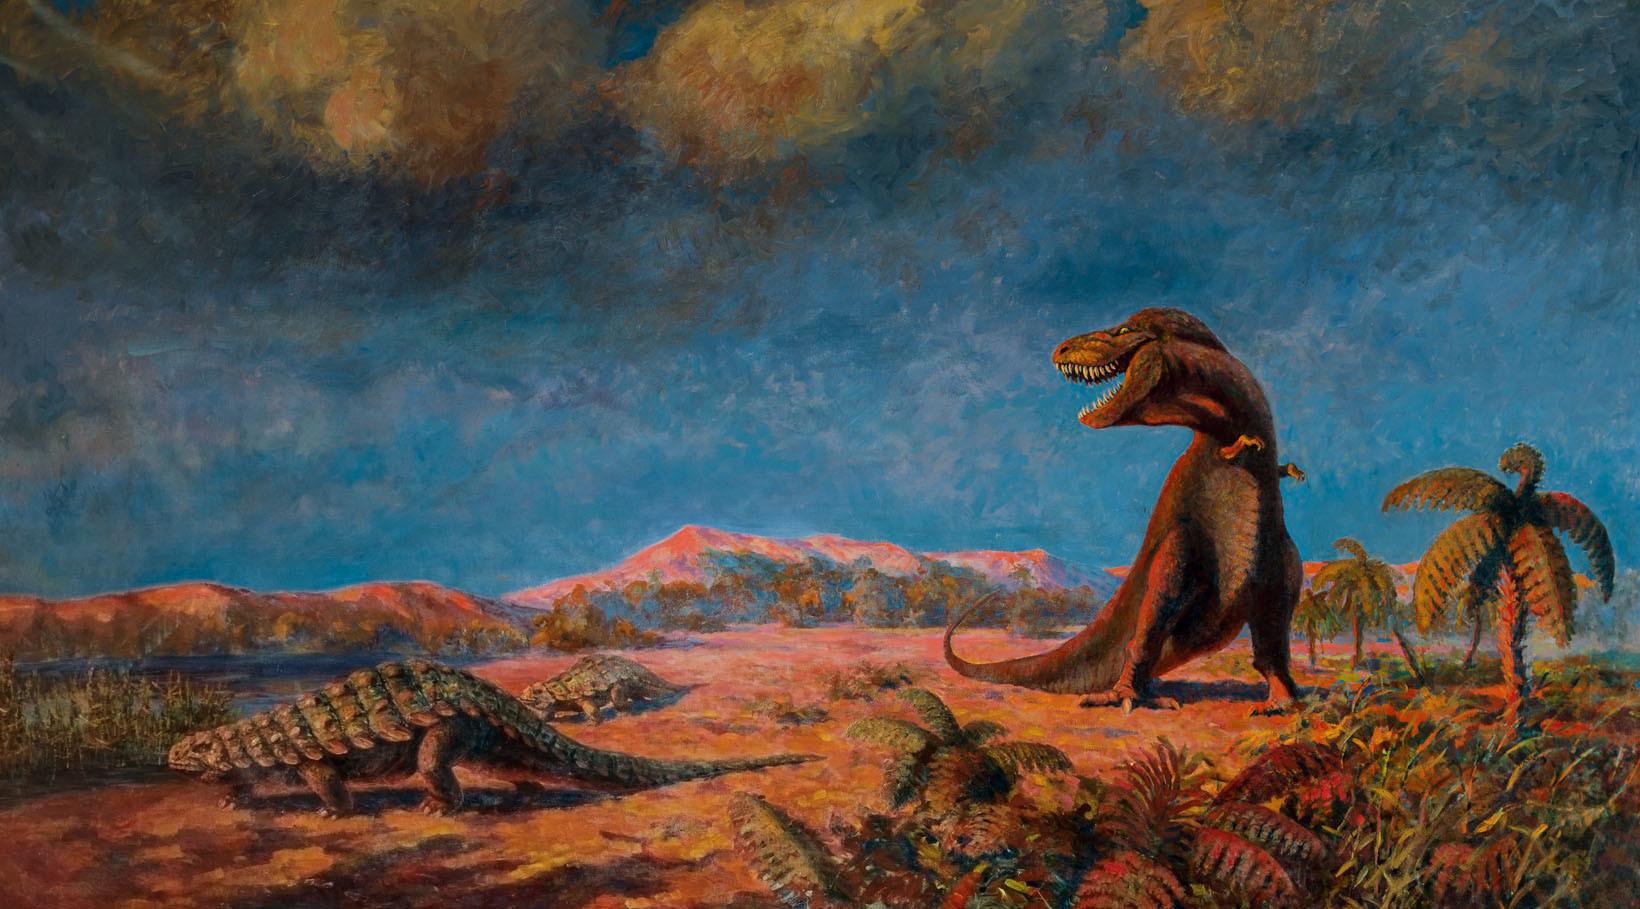 Tarbosaurus and armored dinosaur by Konstantin Konstantinovich Flyorov, circa 1955.